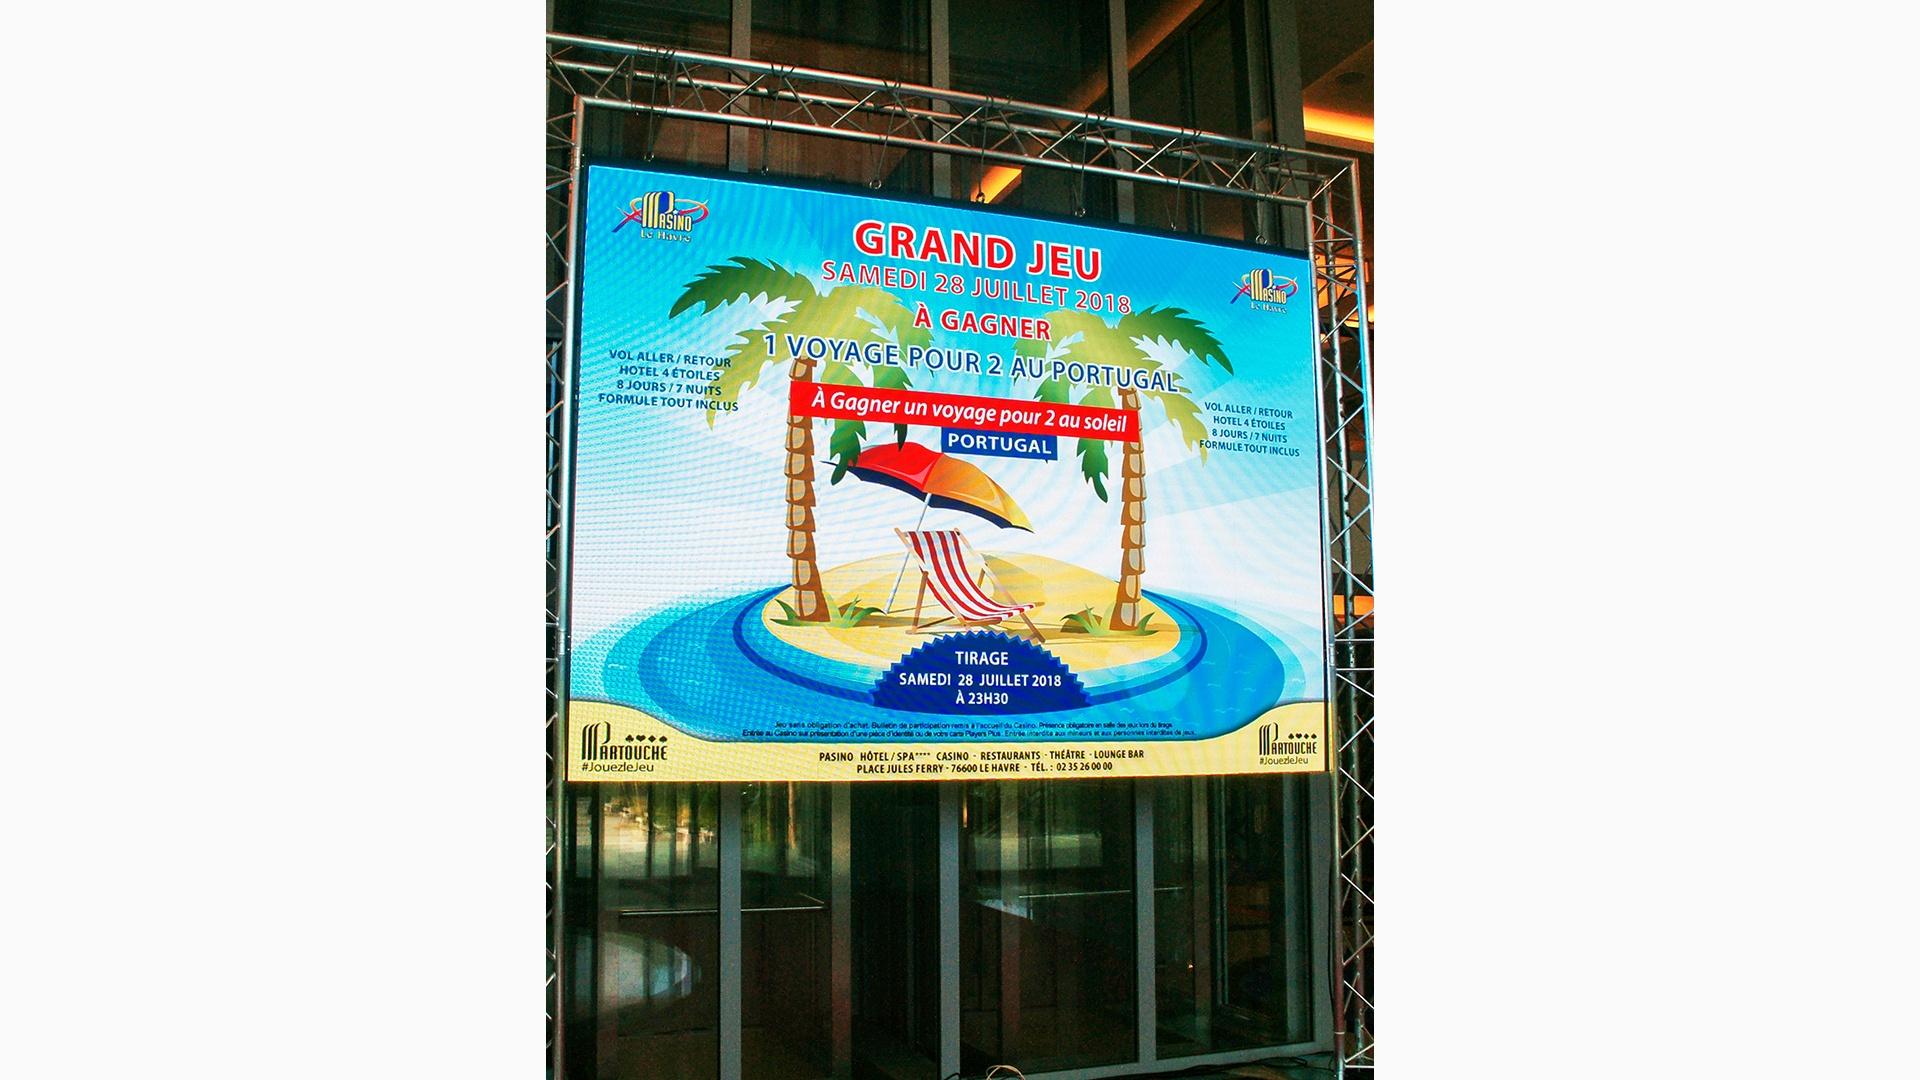 screenfit media produit outdoor splendide casino